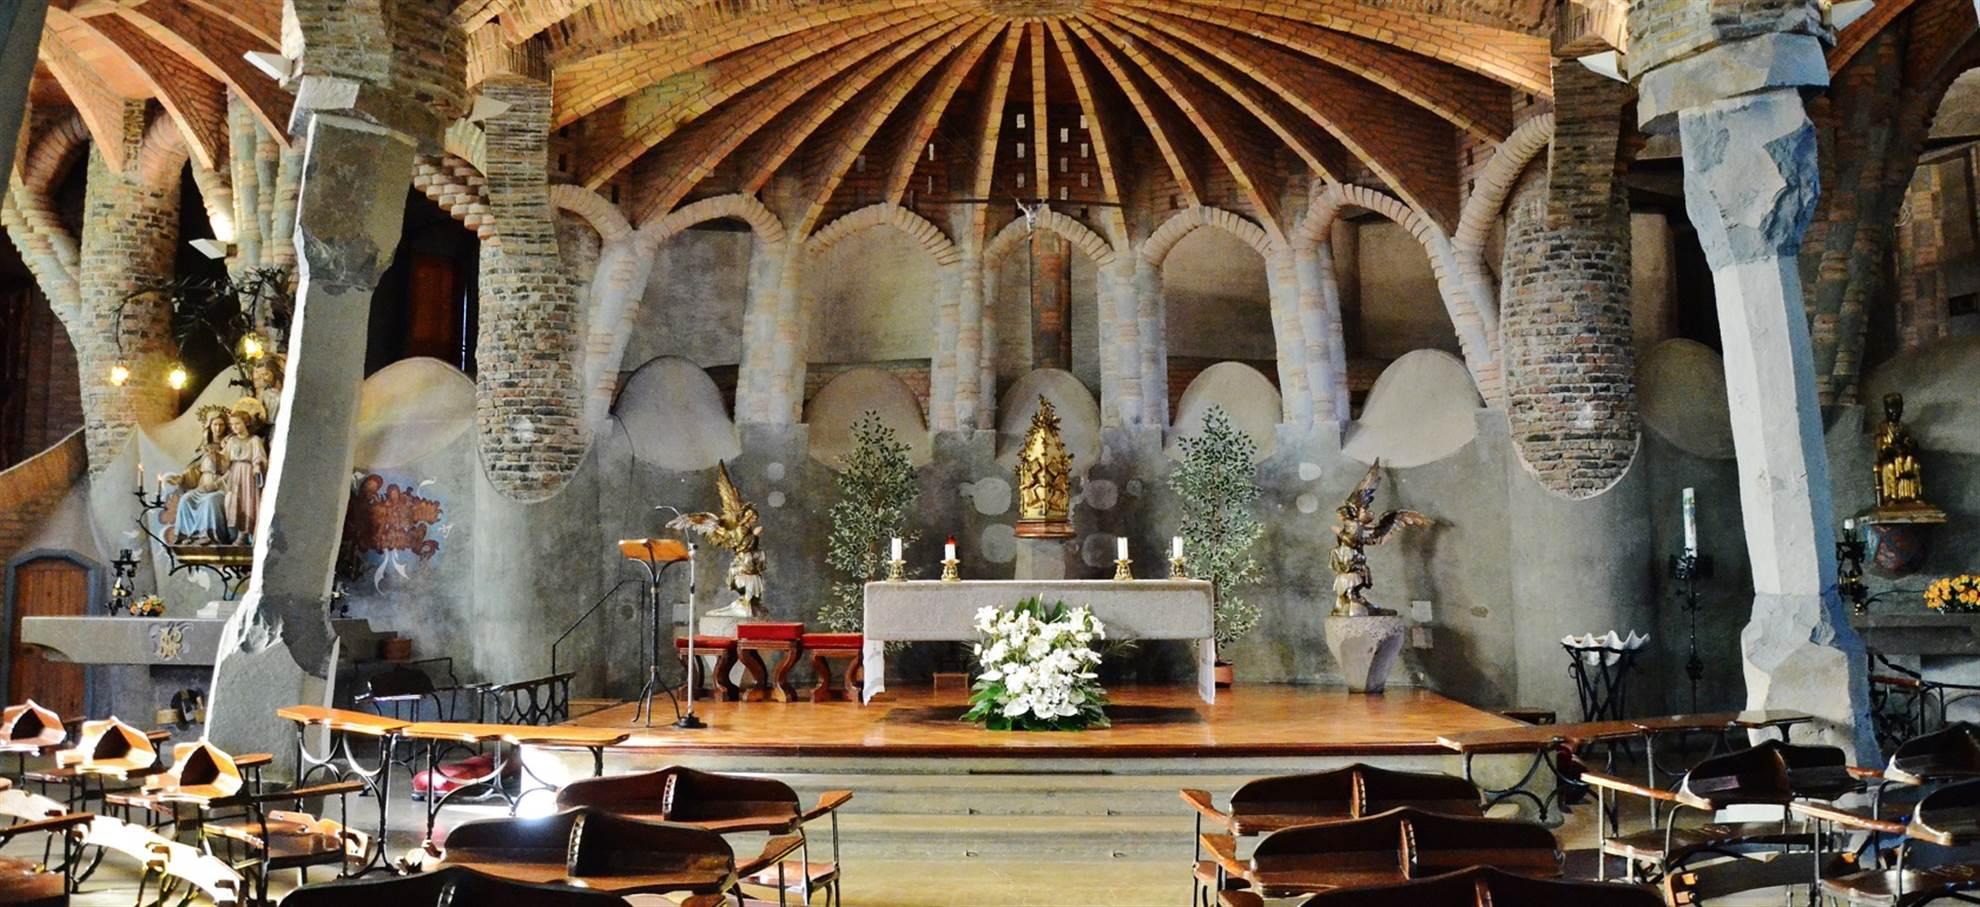 Montserrat & Gaudi's Crypte